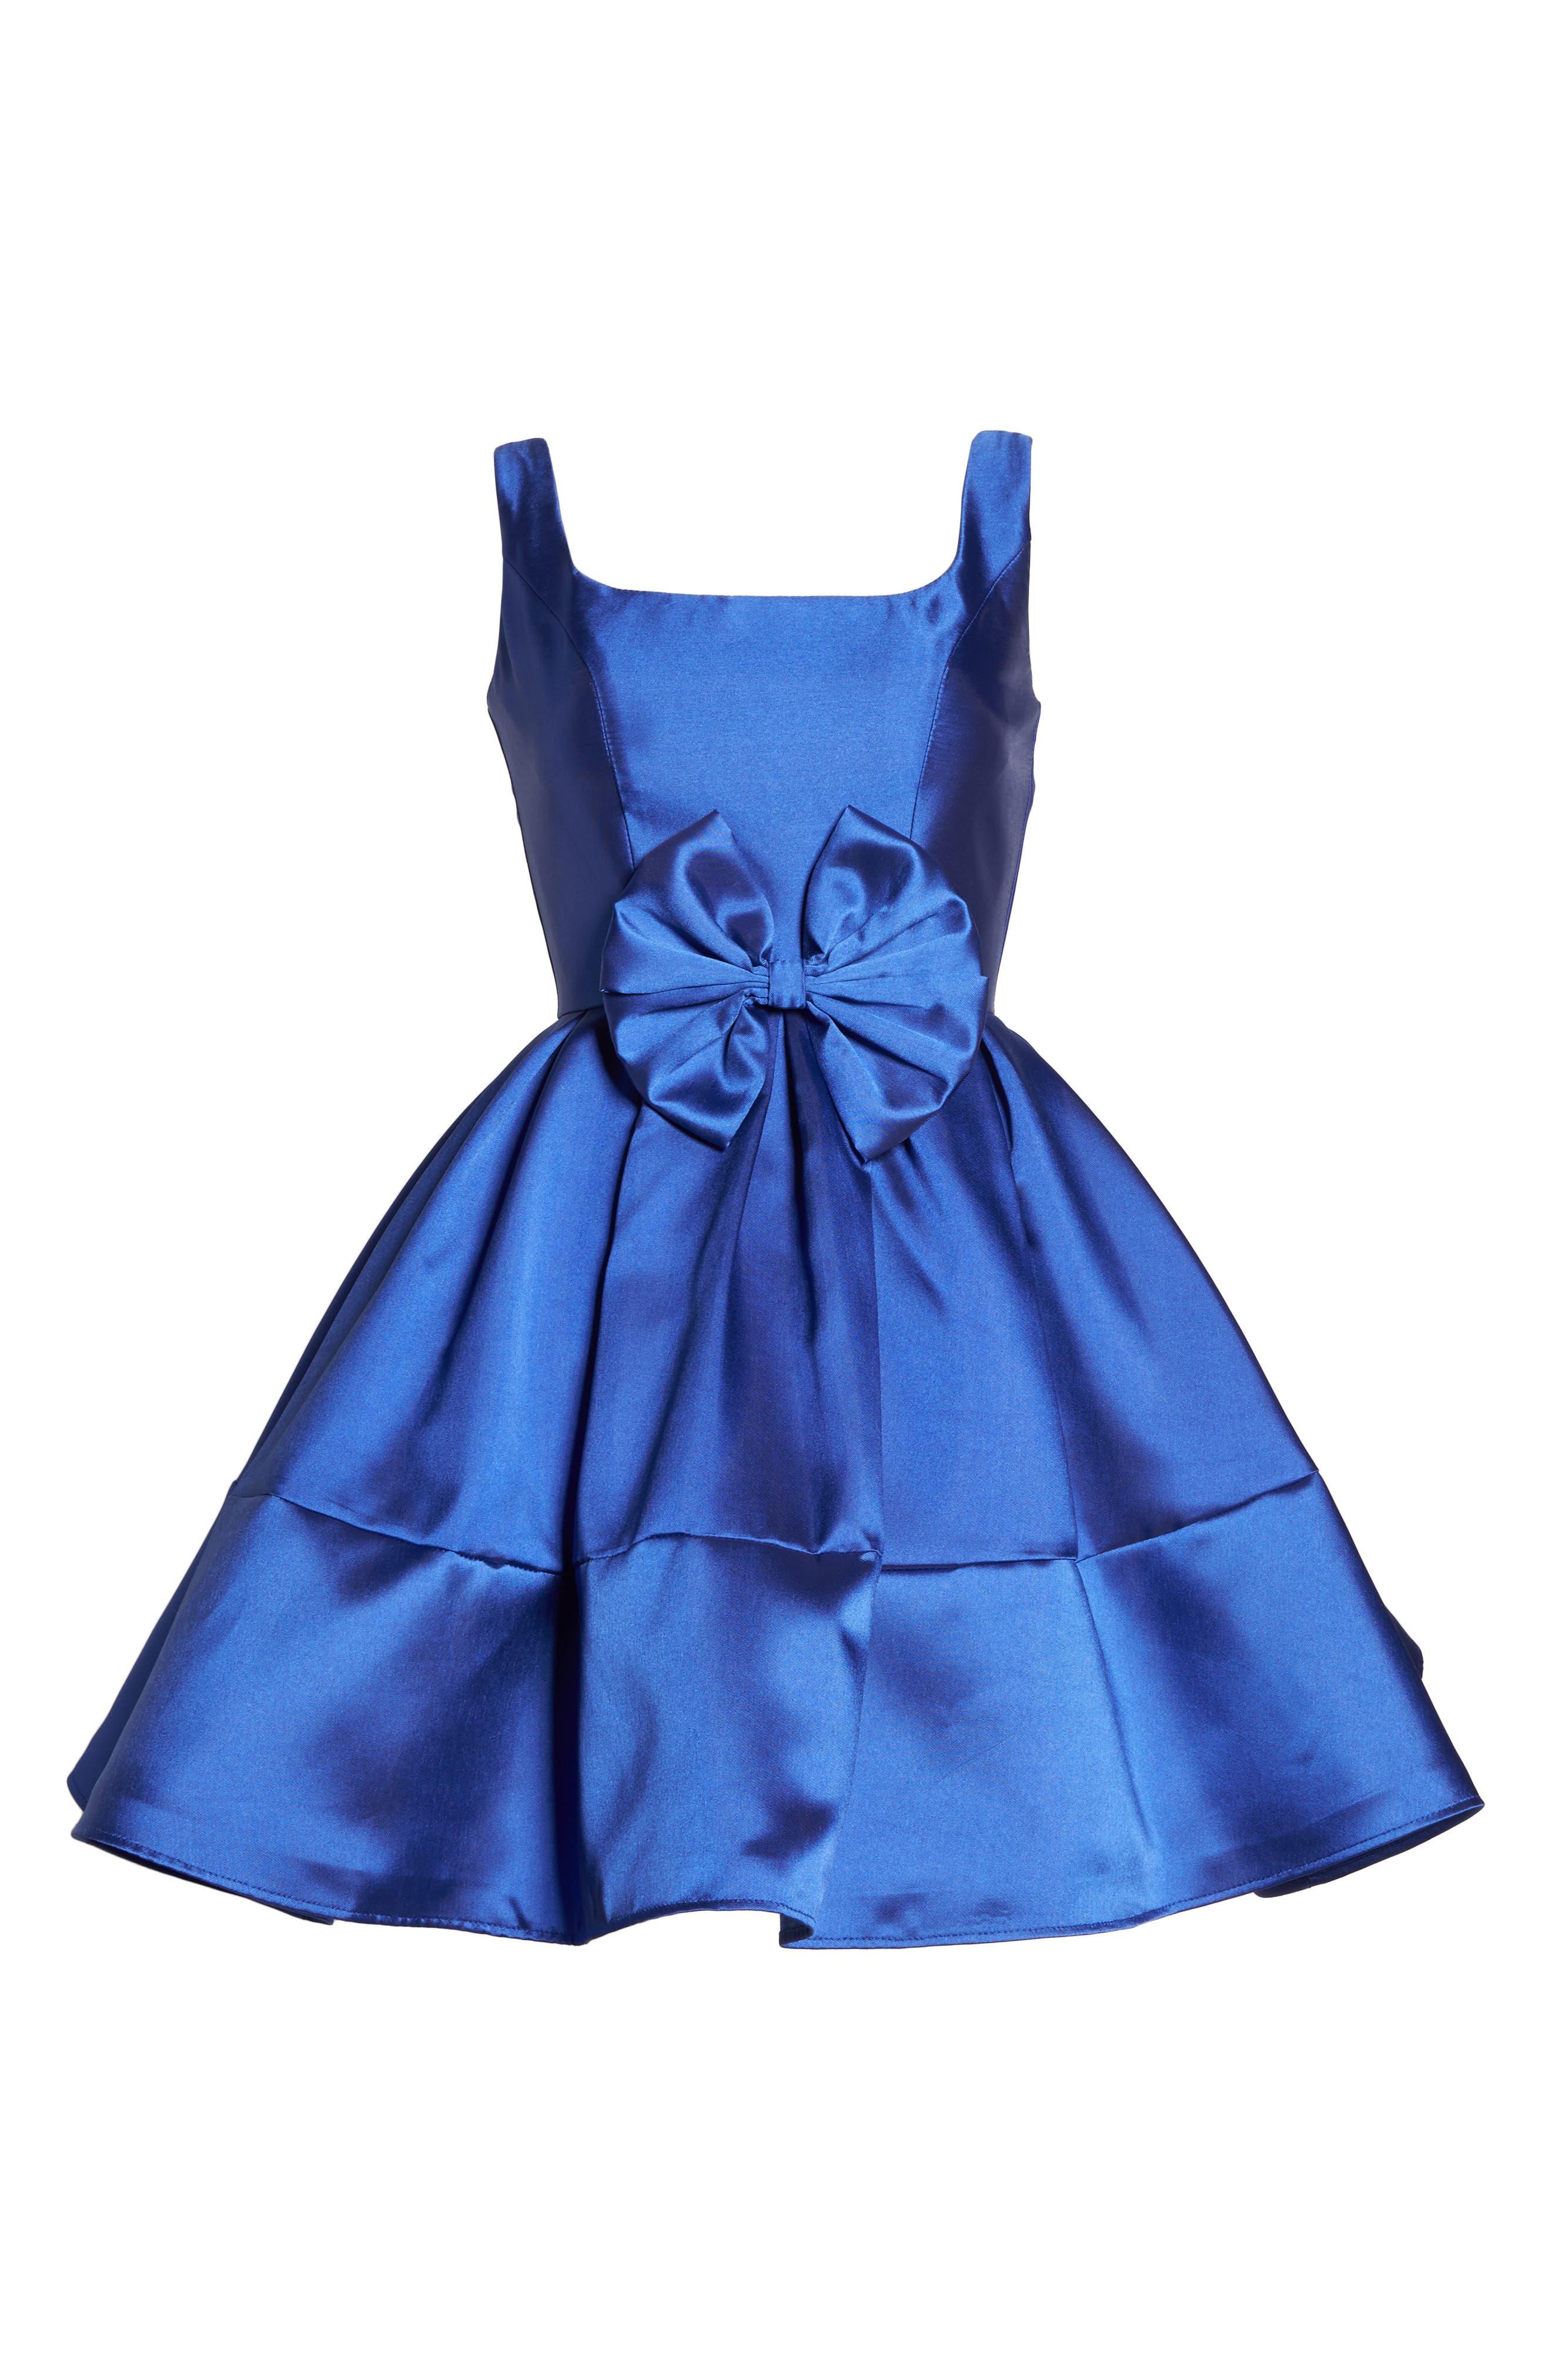 Square Neck Mikado Party Dress,                             Alternate thumbnail 6, color,                             415